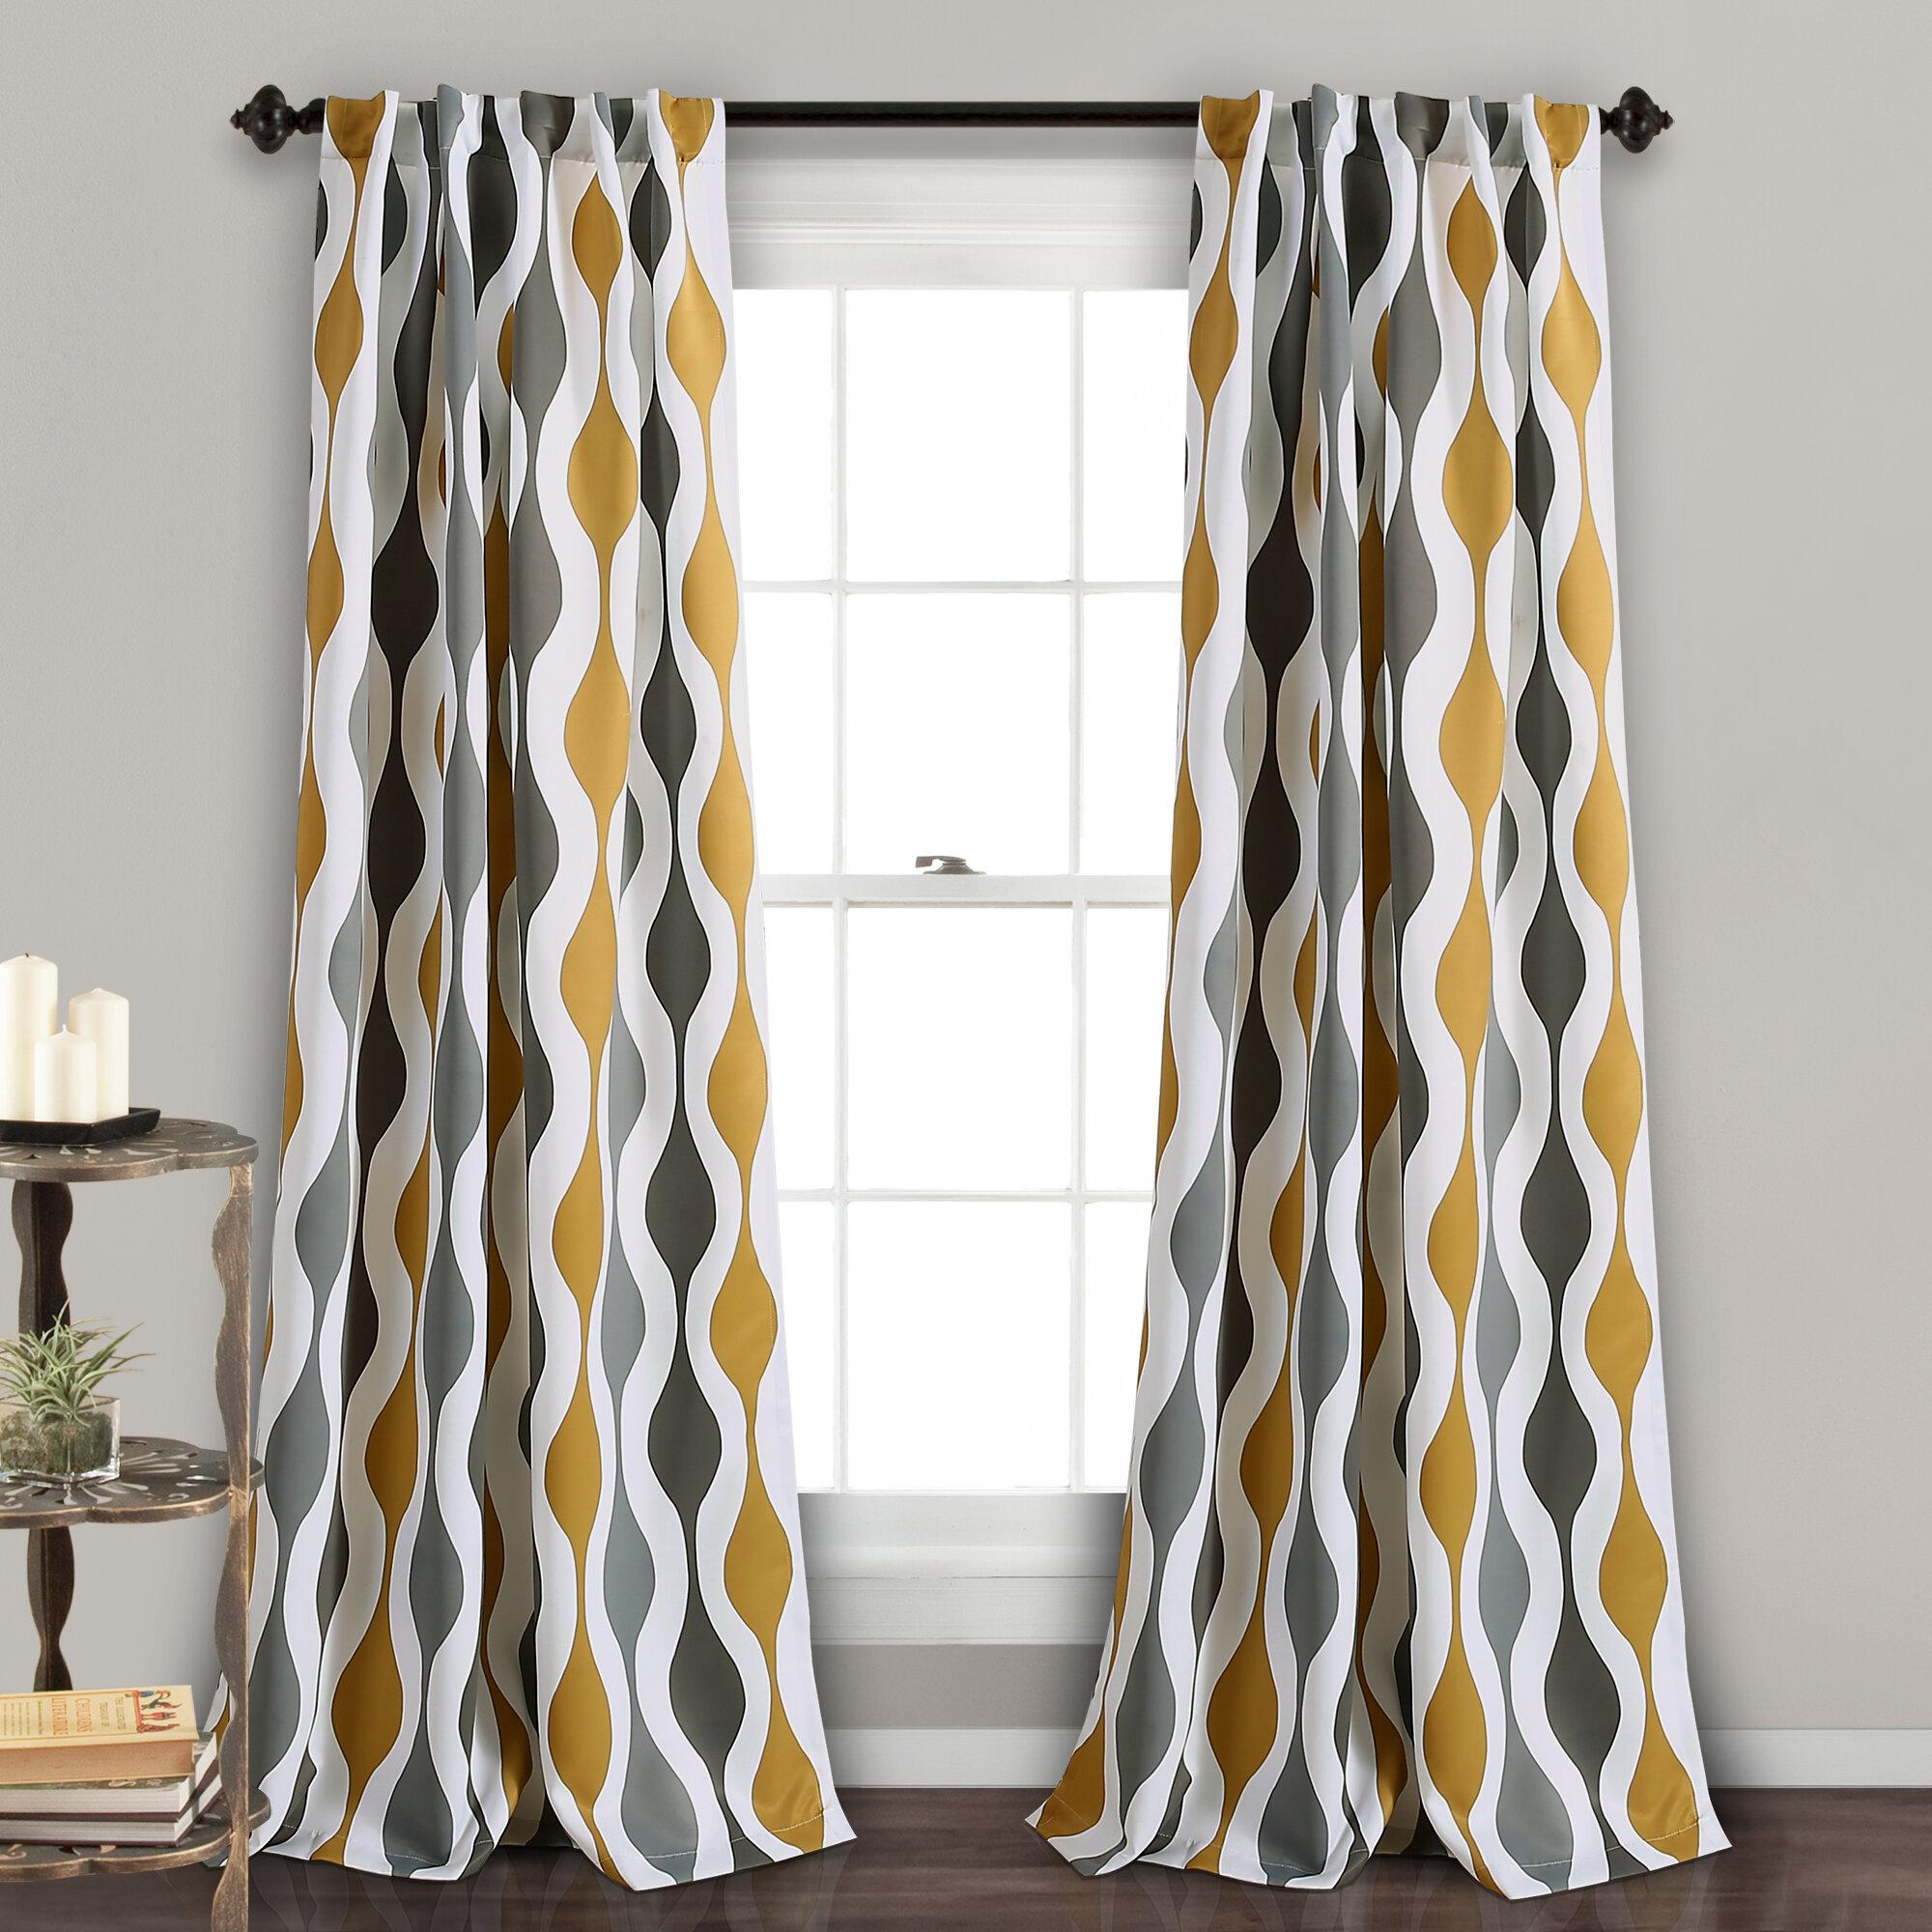 Corrigan Studio Geometric Room Darkening Thermal Back Tab Rod Pocket Curtain Panels Reviews Wayfair